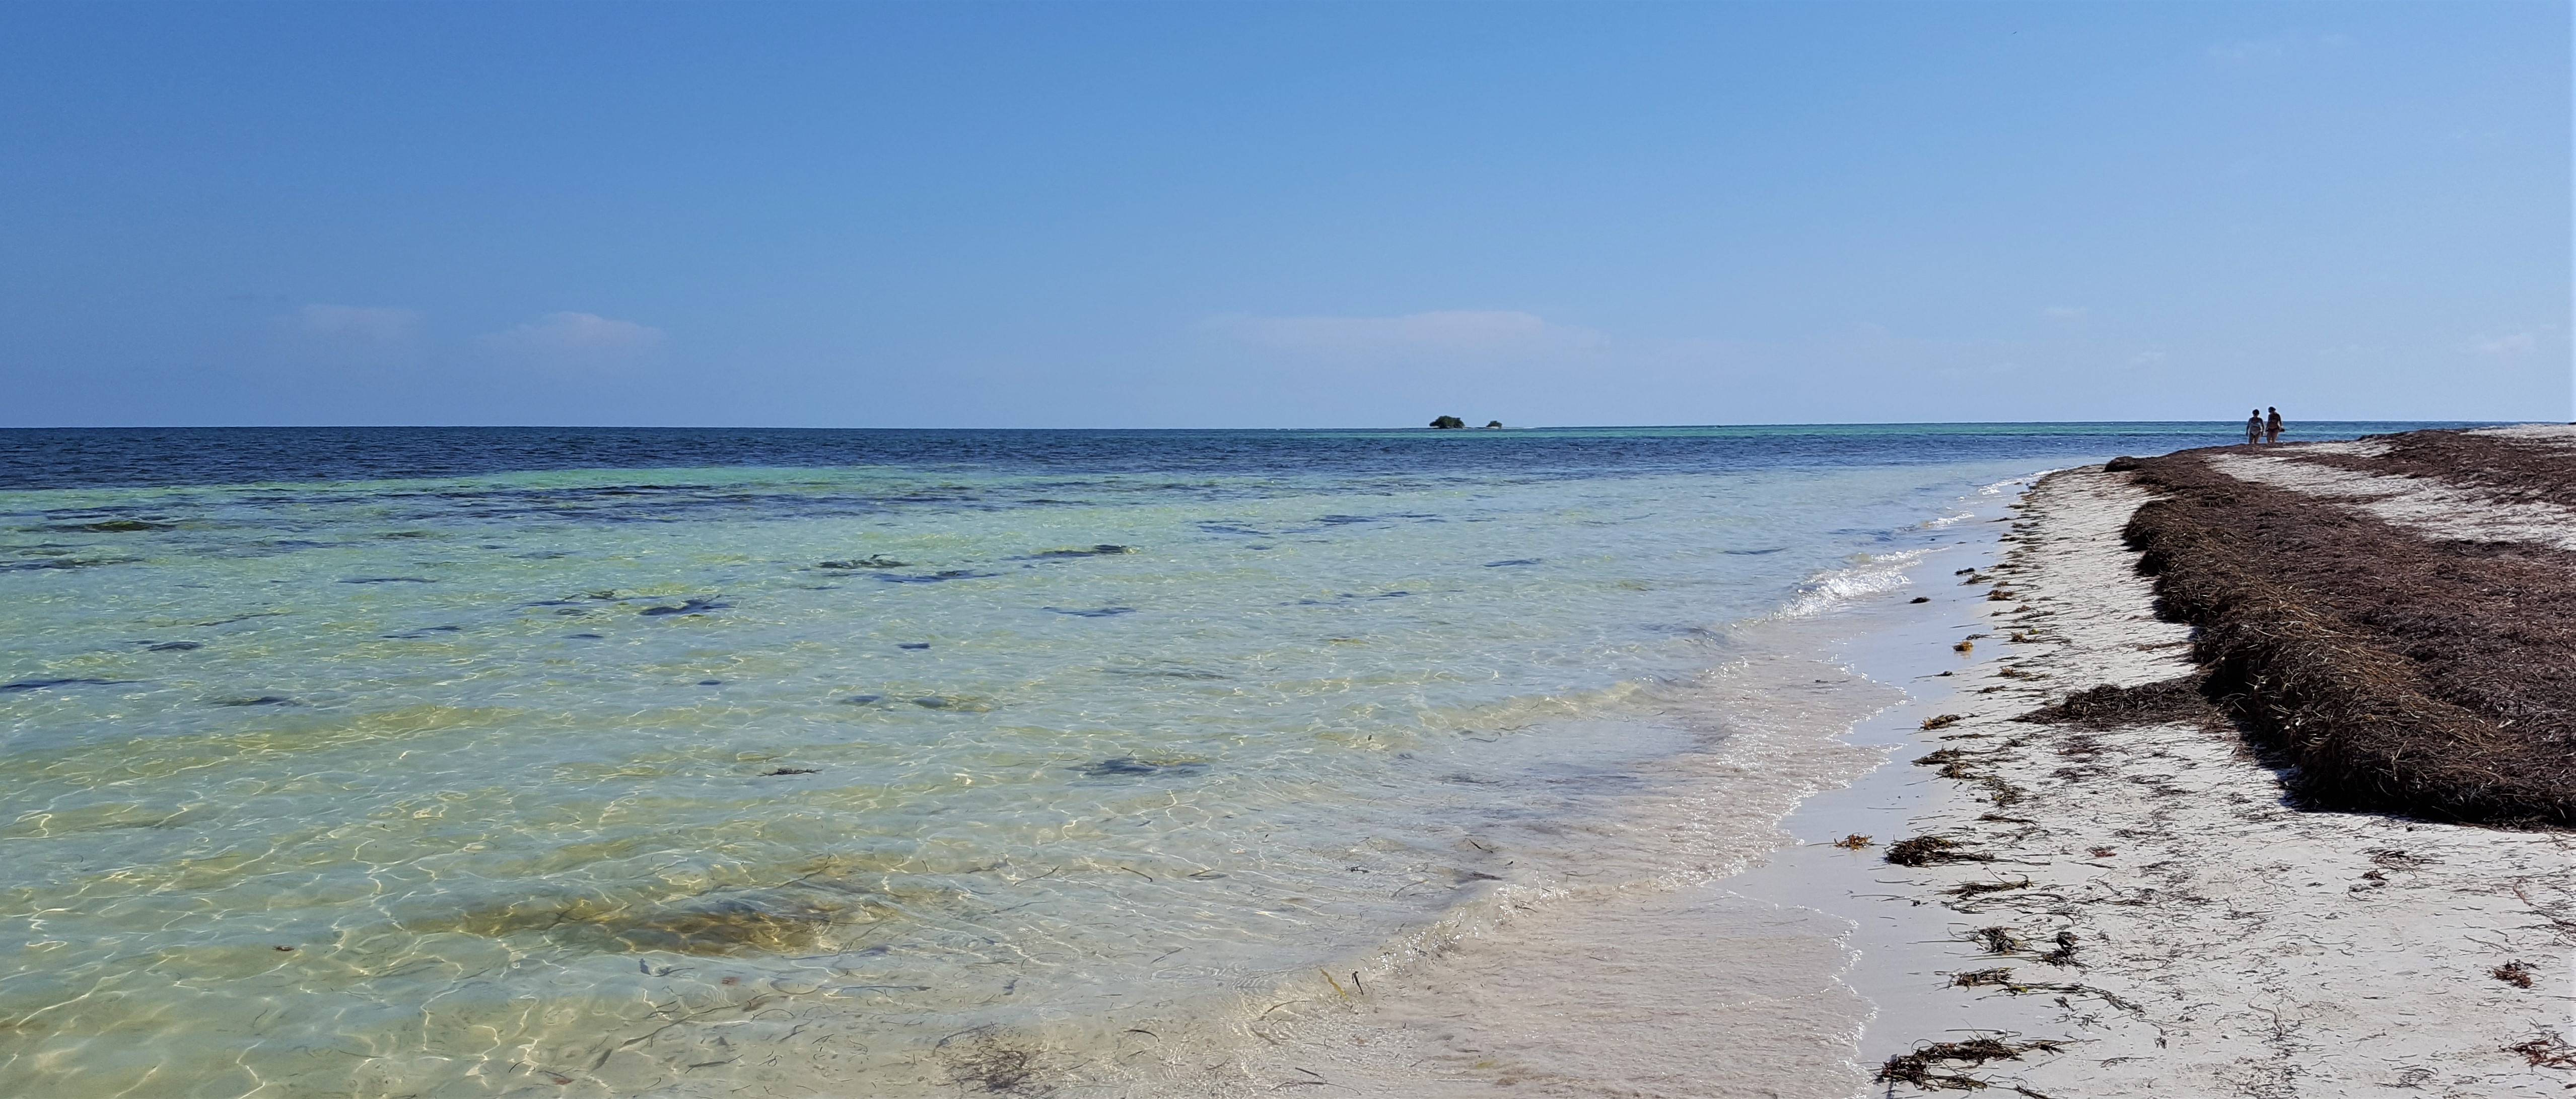 Bahia Honda state Park Bilferie stopp